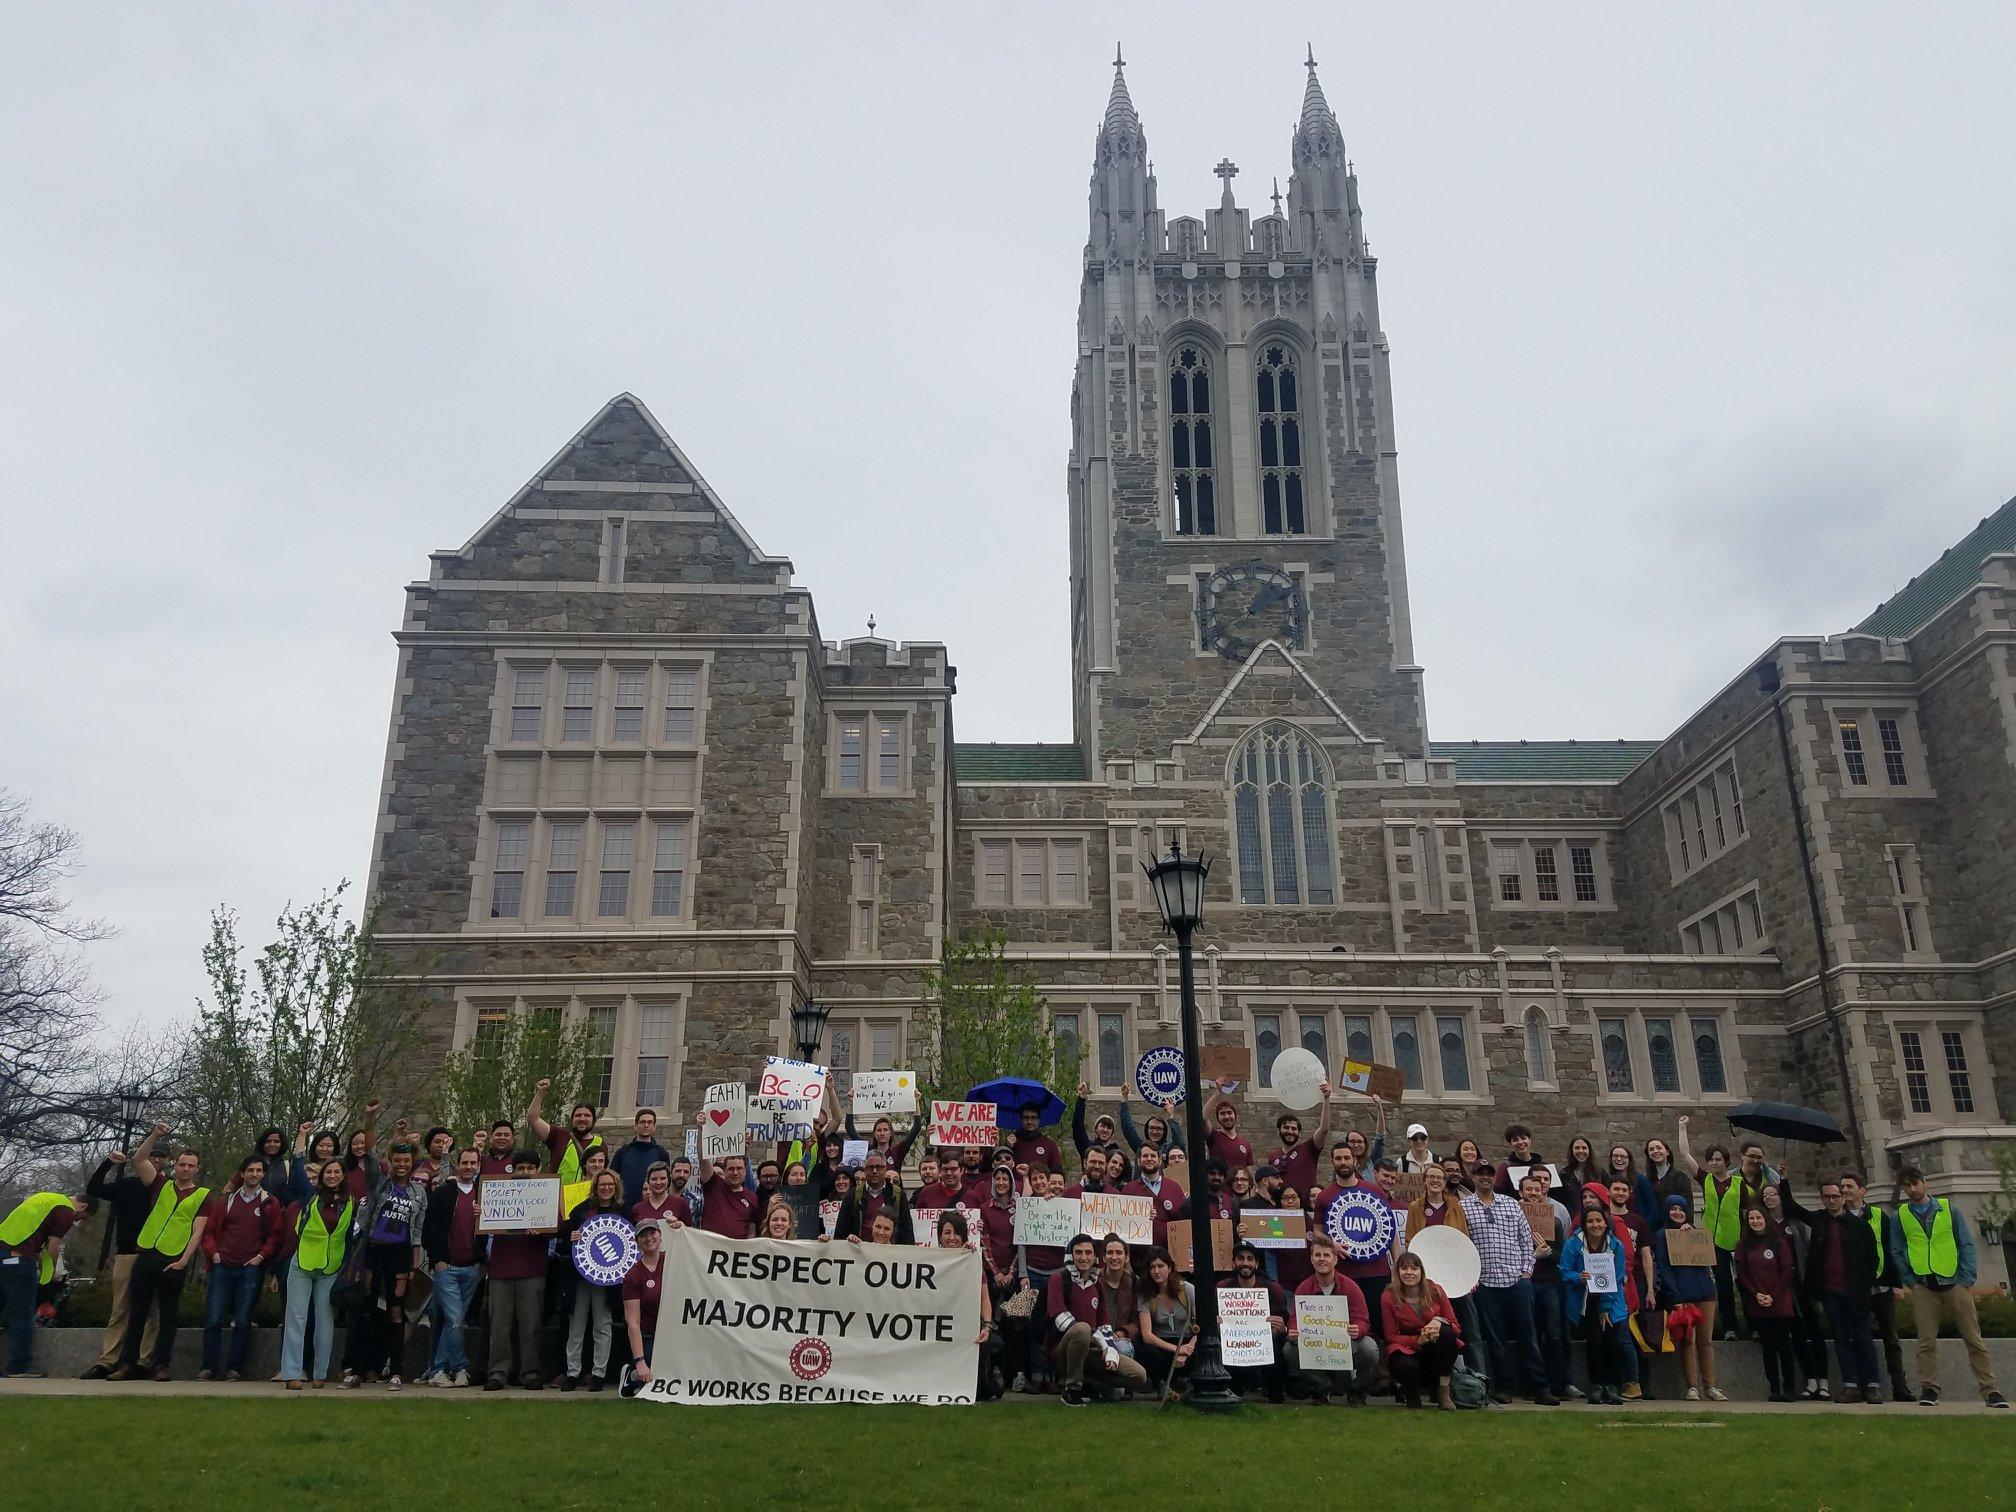 BostonCollegeStudentsInFrontofGothicBuilding